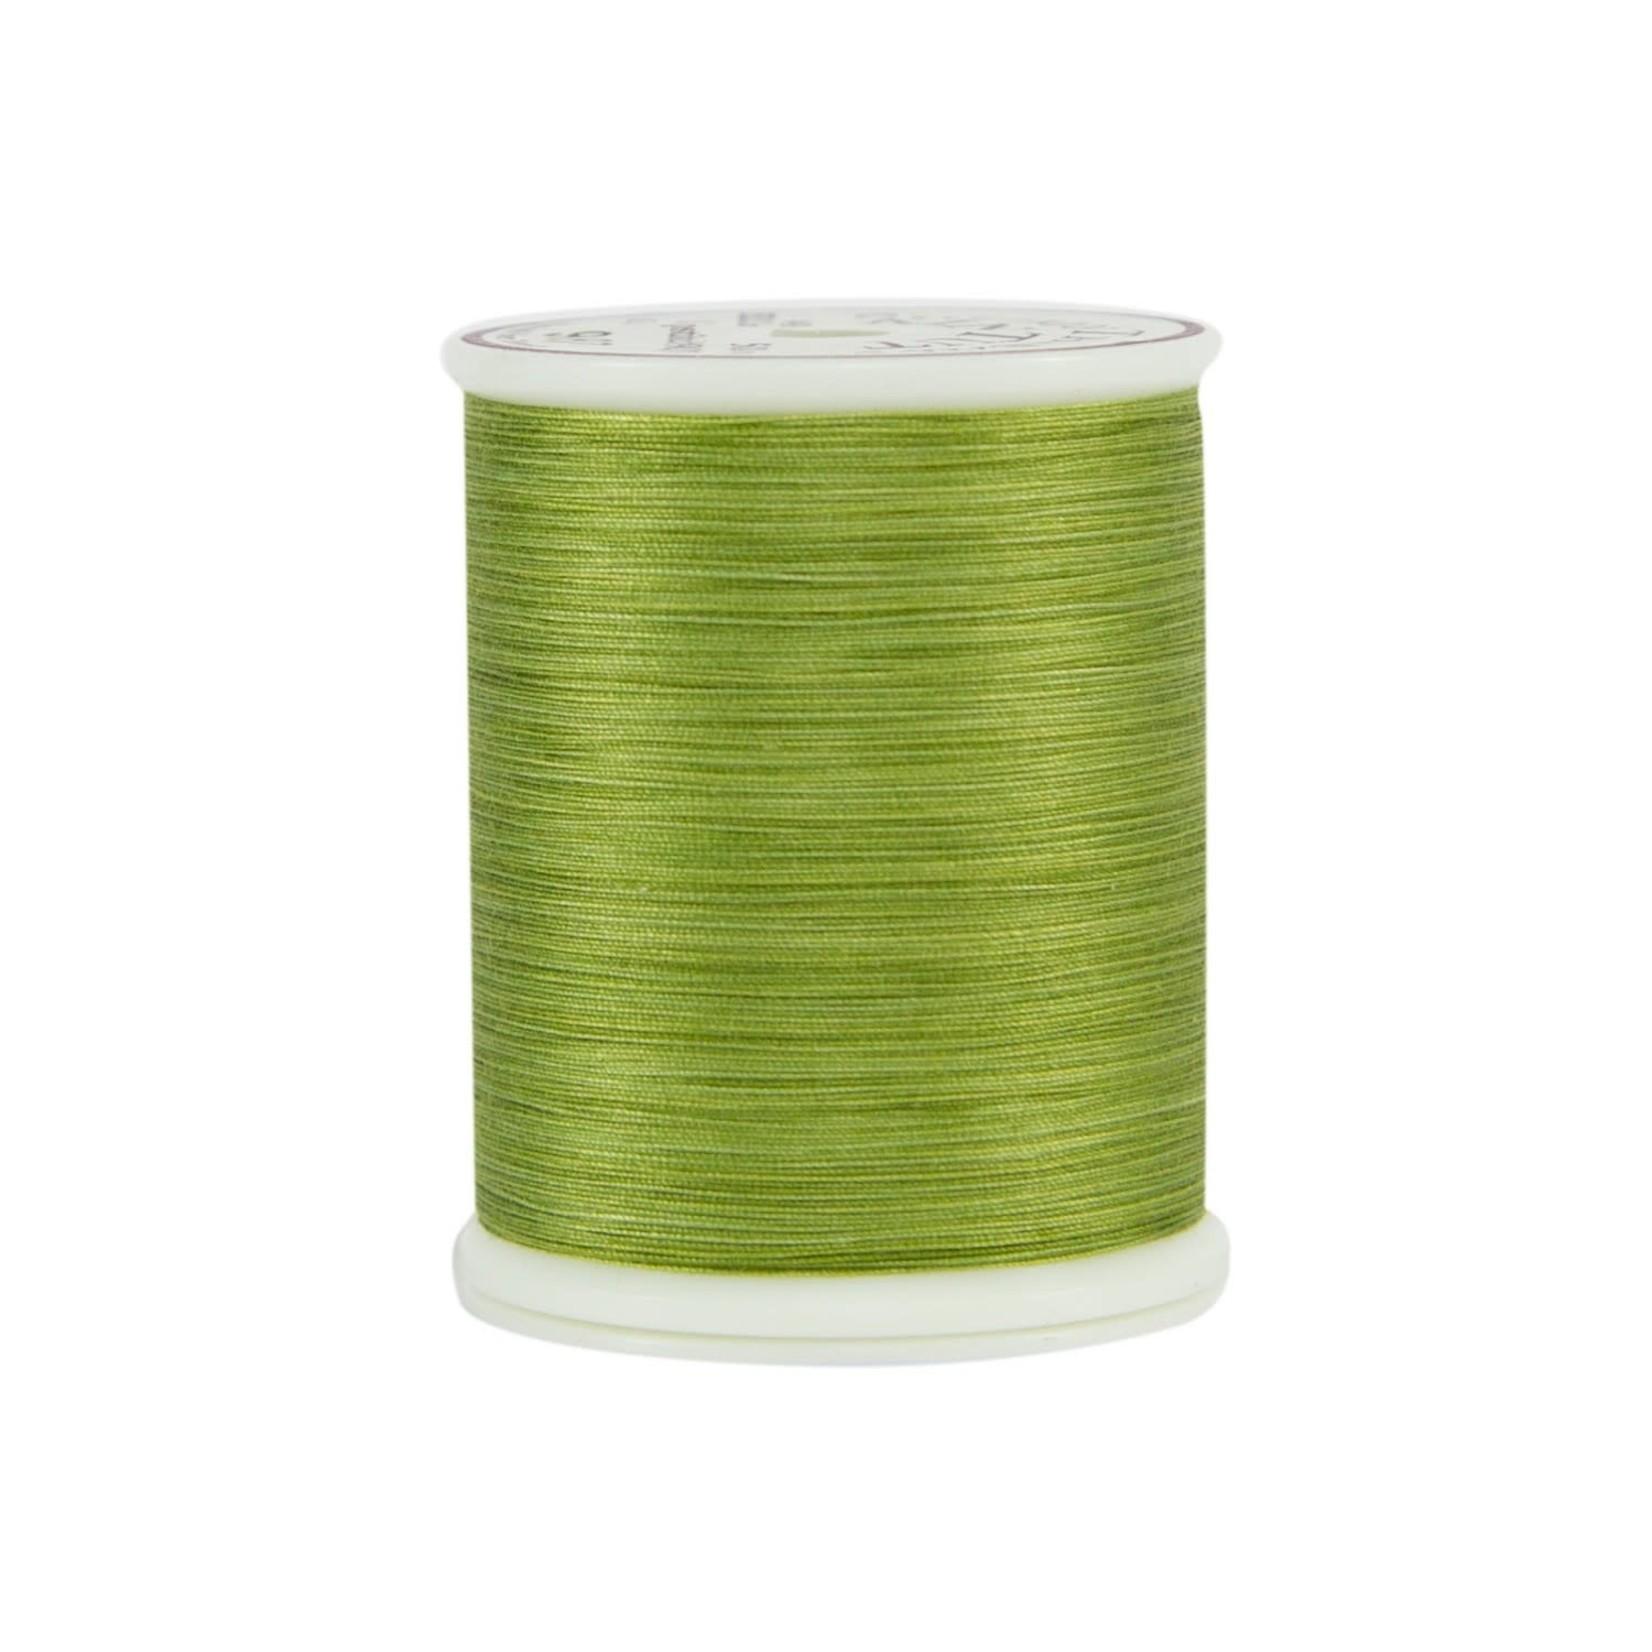 Superior Threads King Tut - #40 - 457 m - 0987 English Ivy